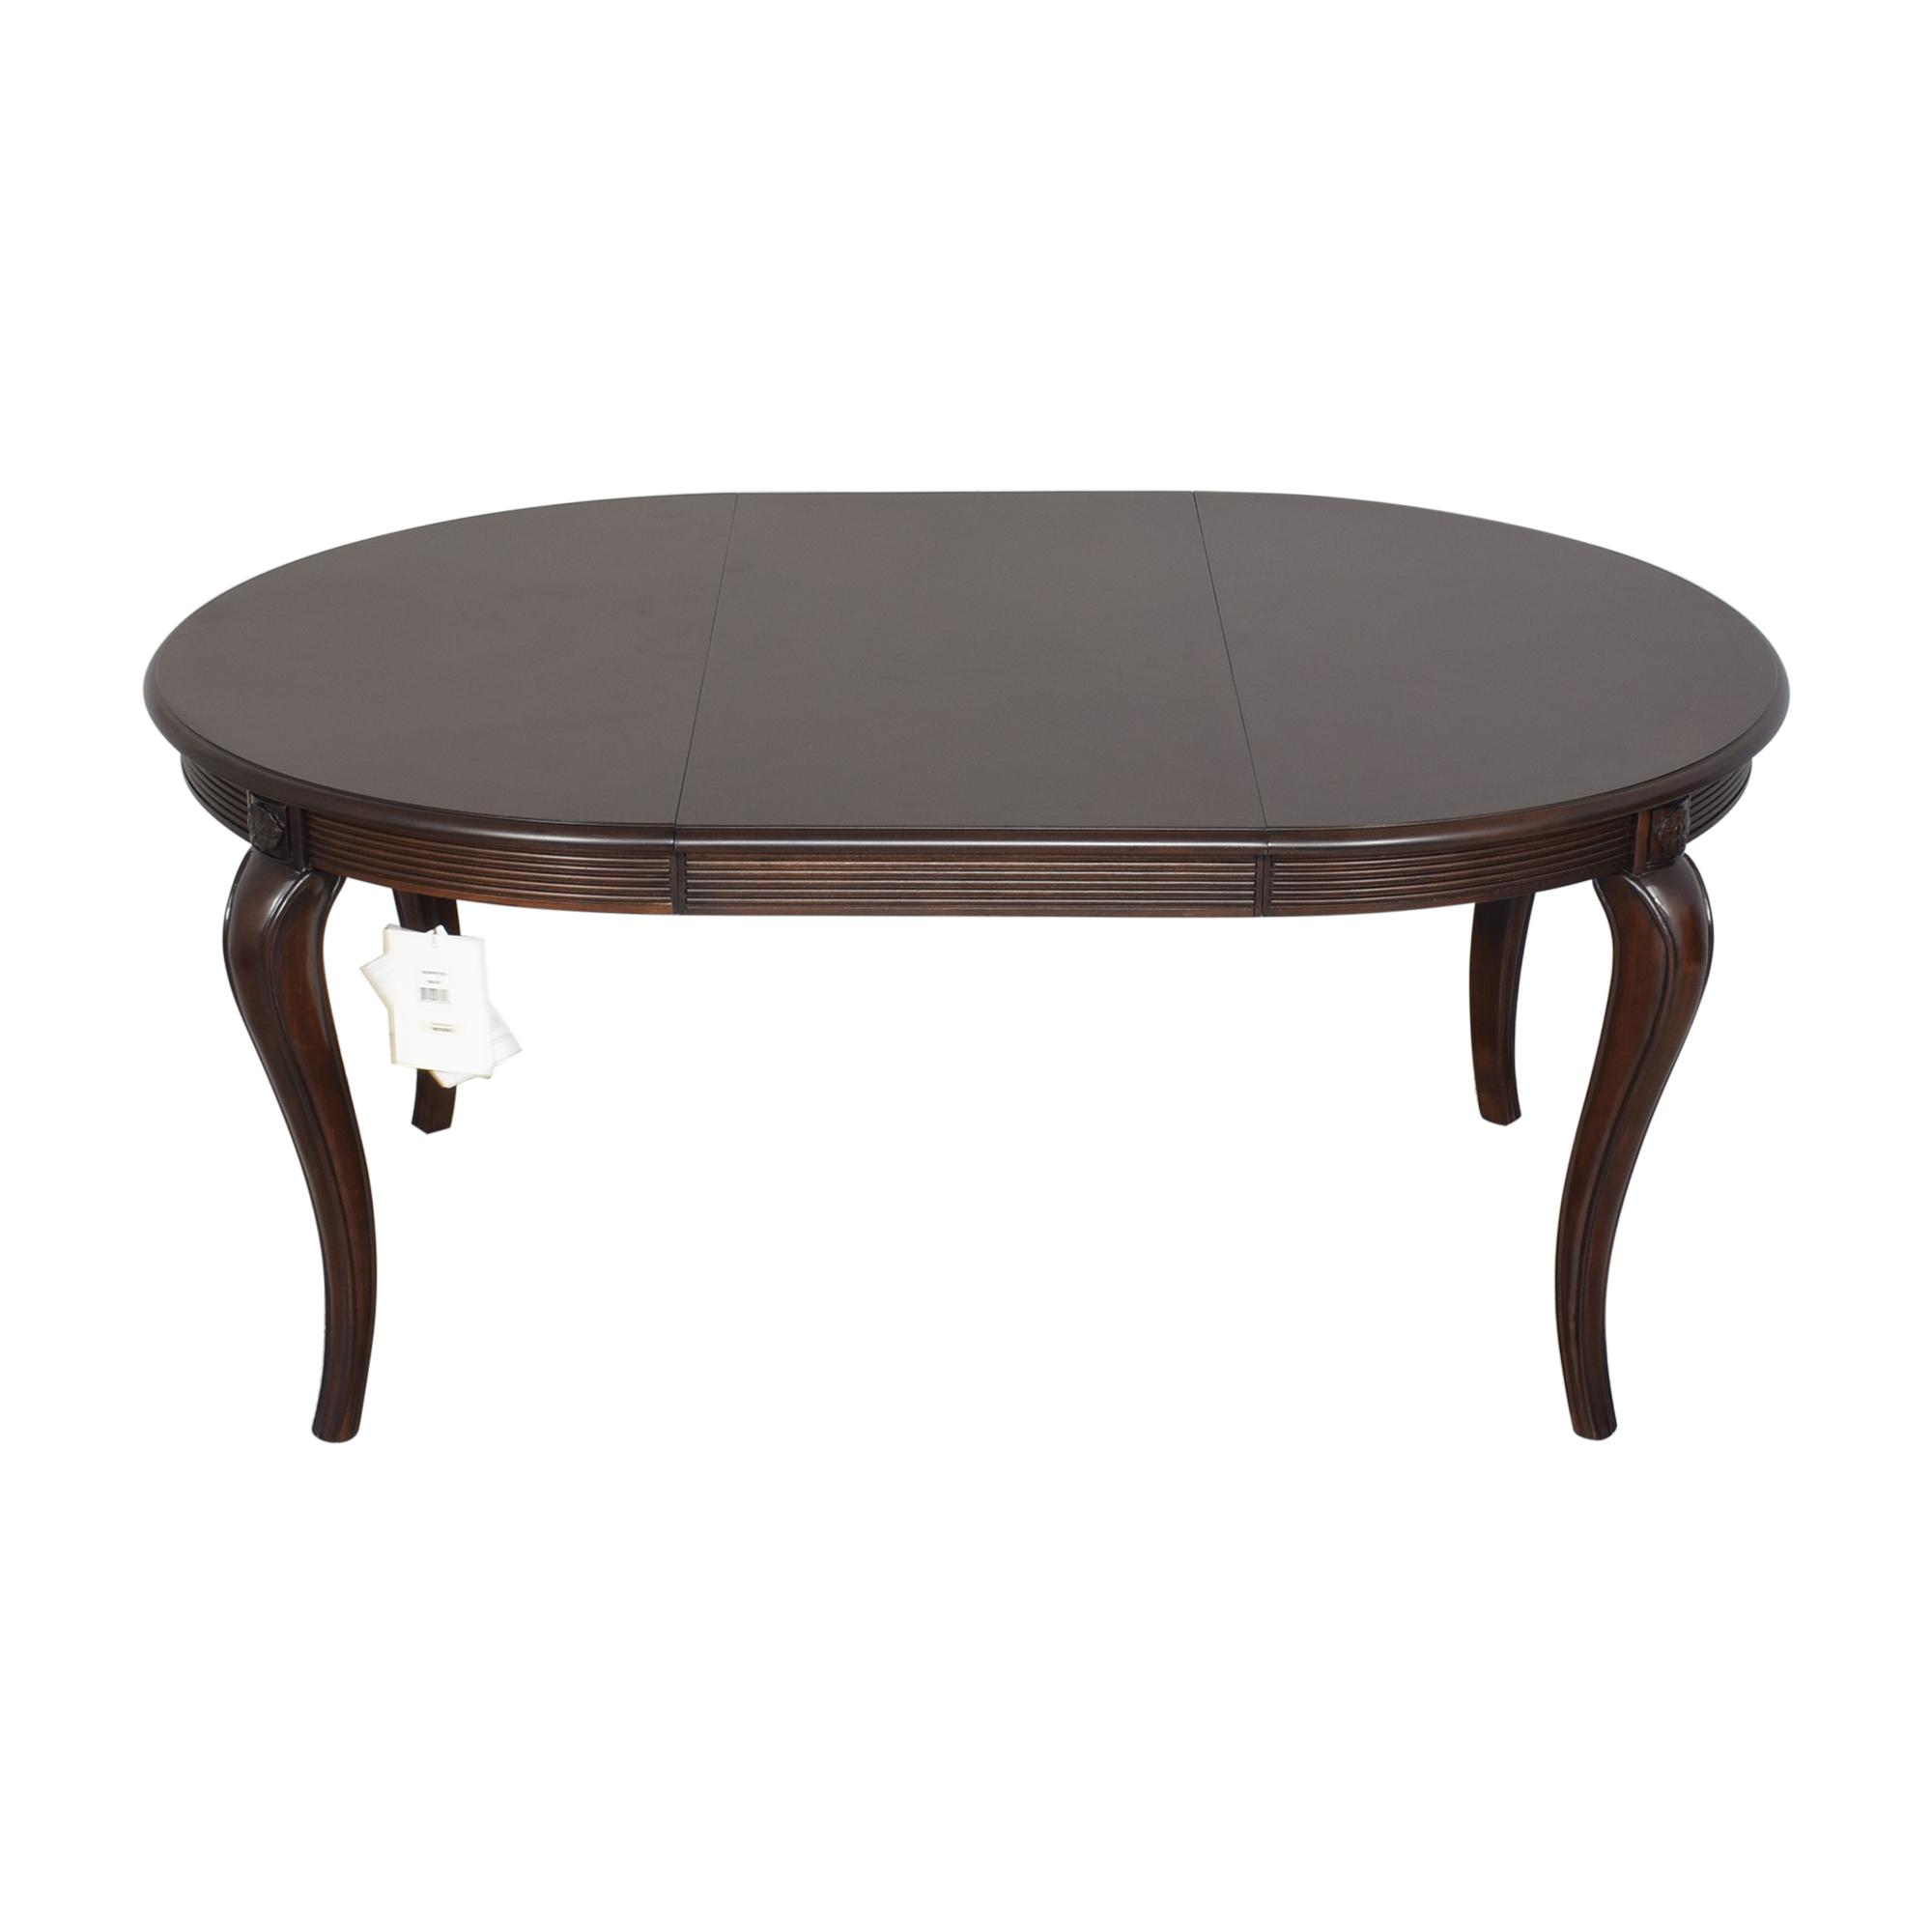 Bernhardt Bernhardt Round Extendable Dining Table ma